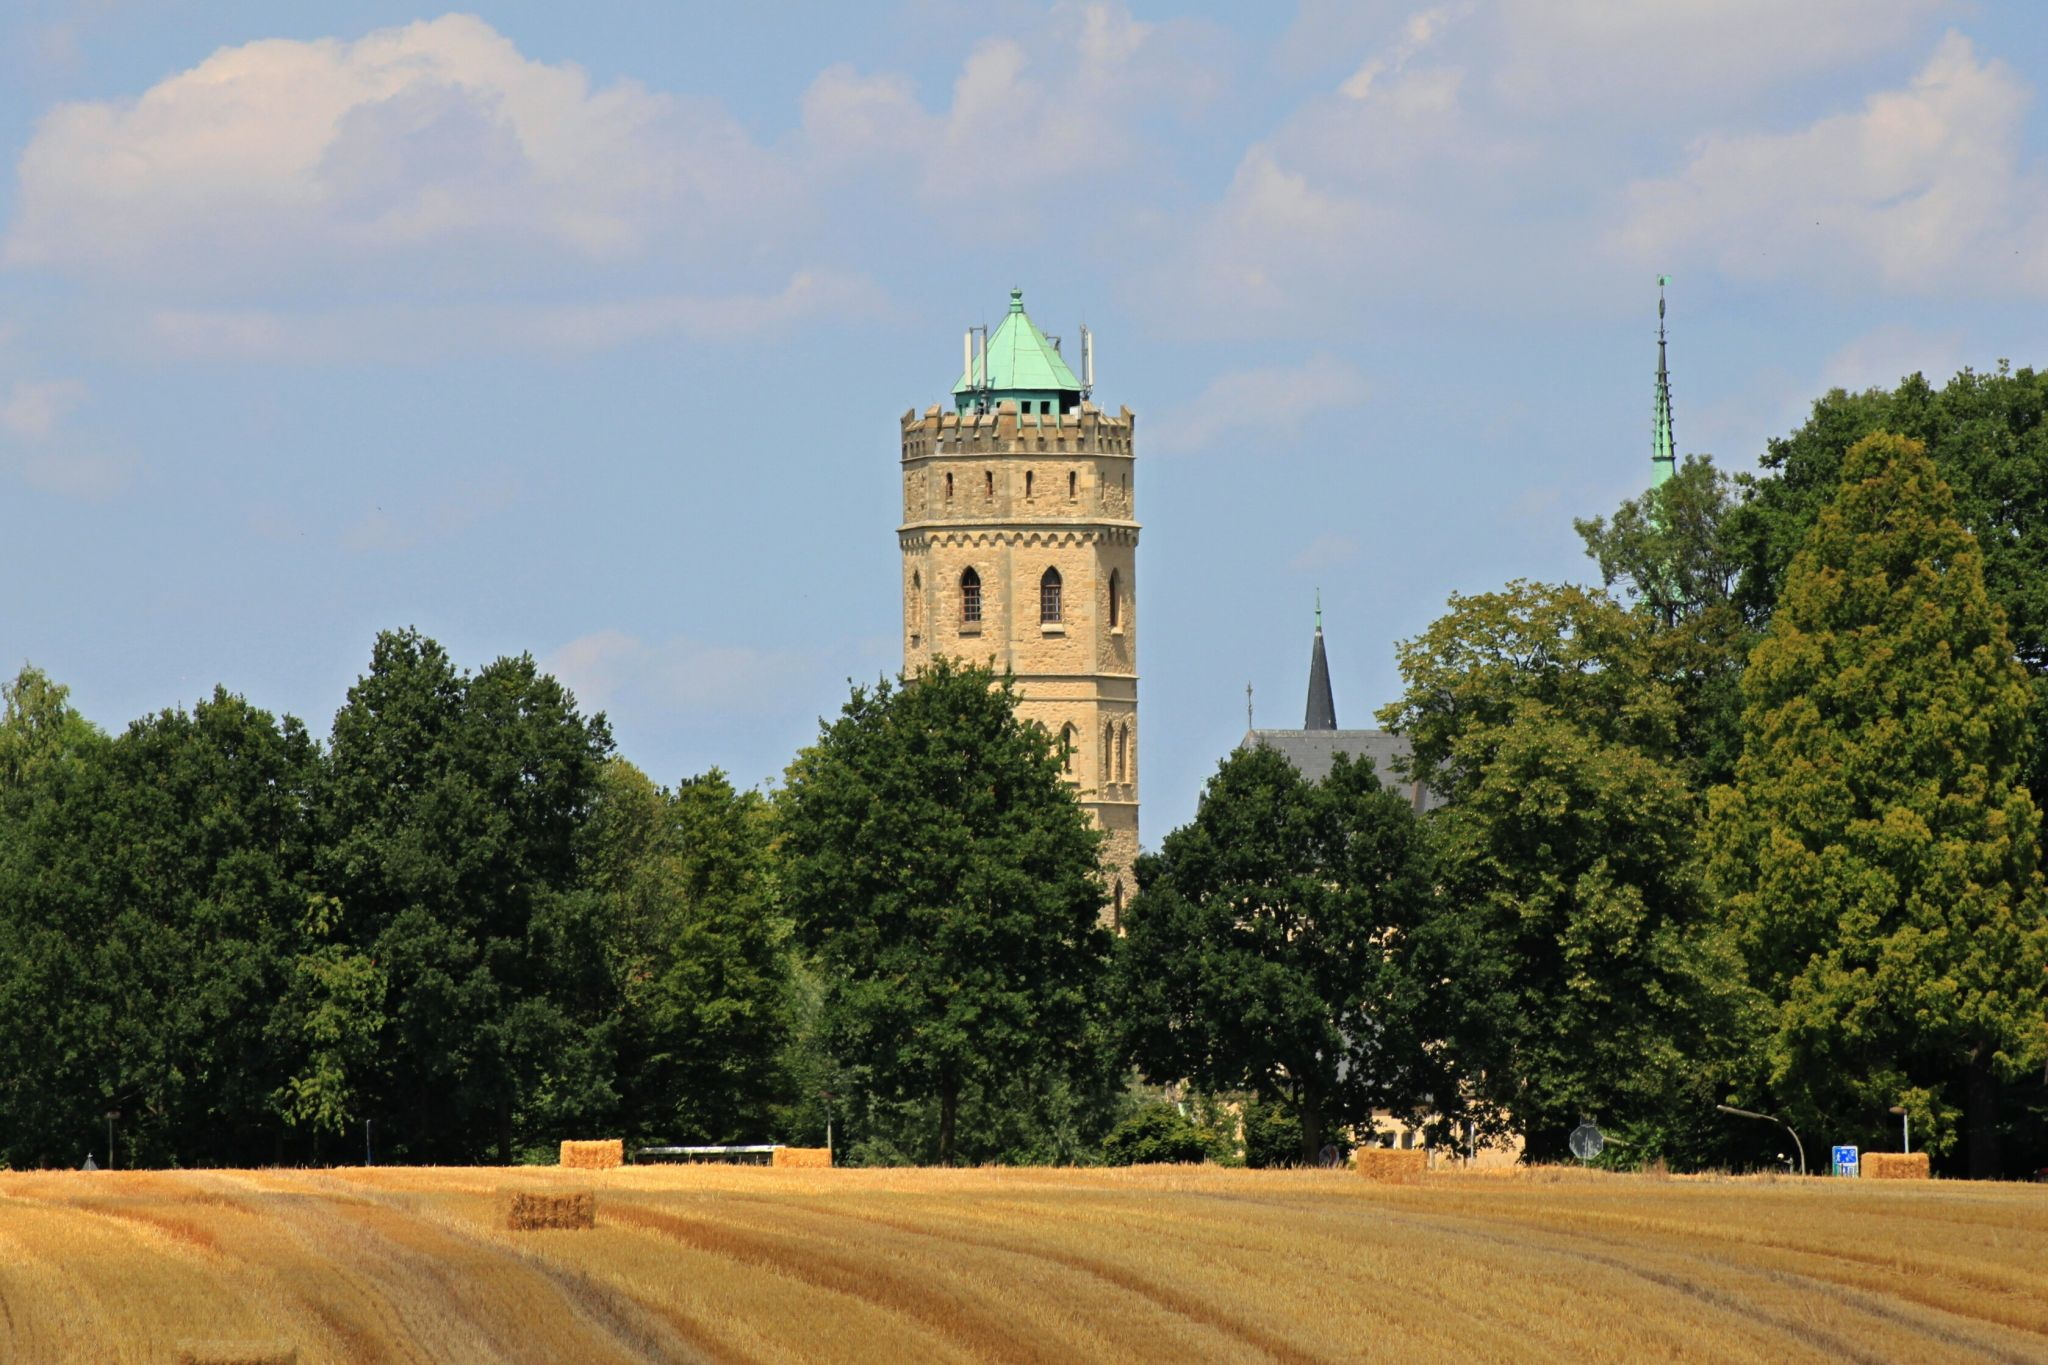 Wasserturm im Stift Tilbeck, Germany